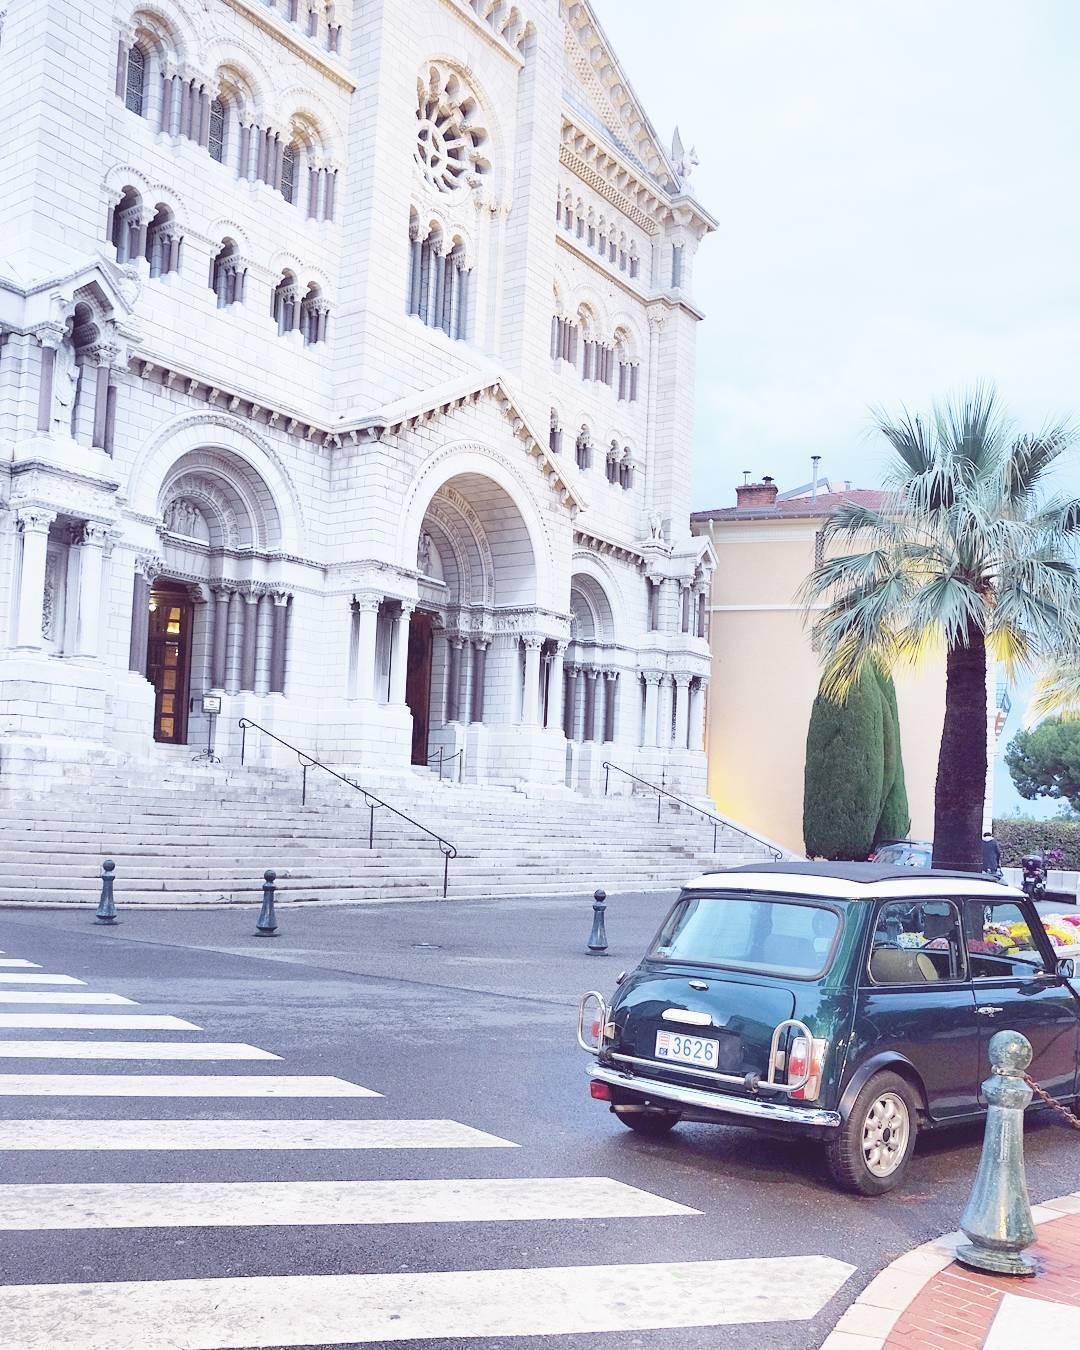 Cathdrale NotreDameImmacule Saint Nicholas Cathedral of Monaco